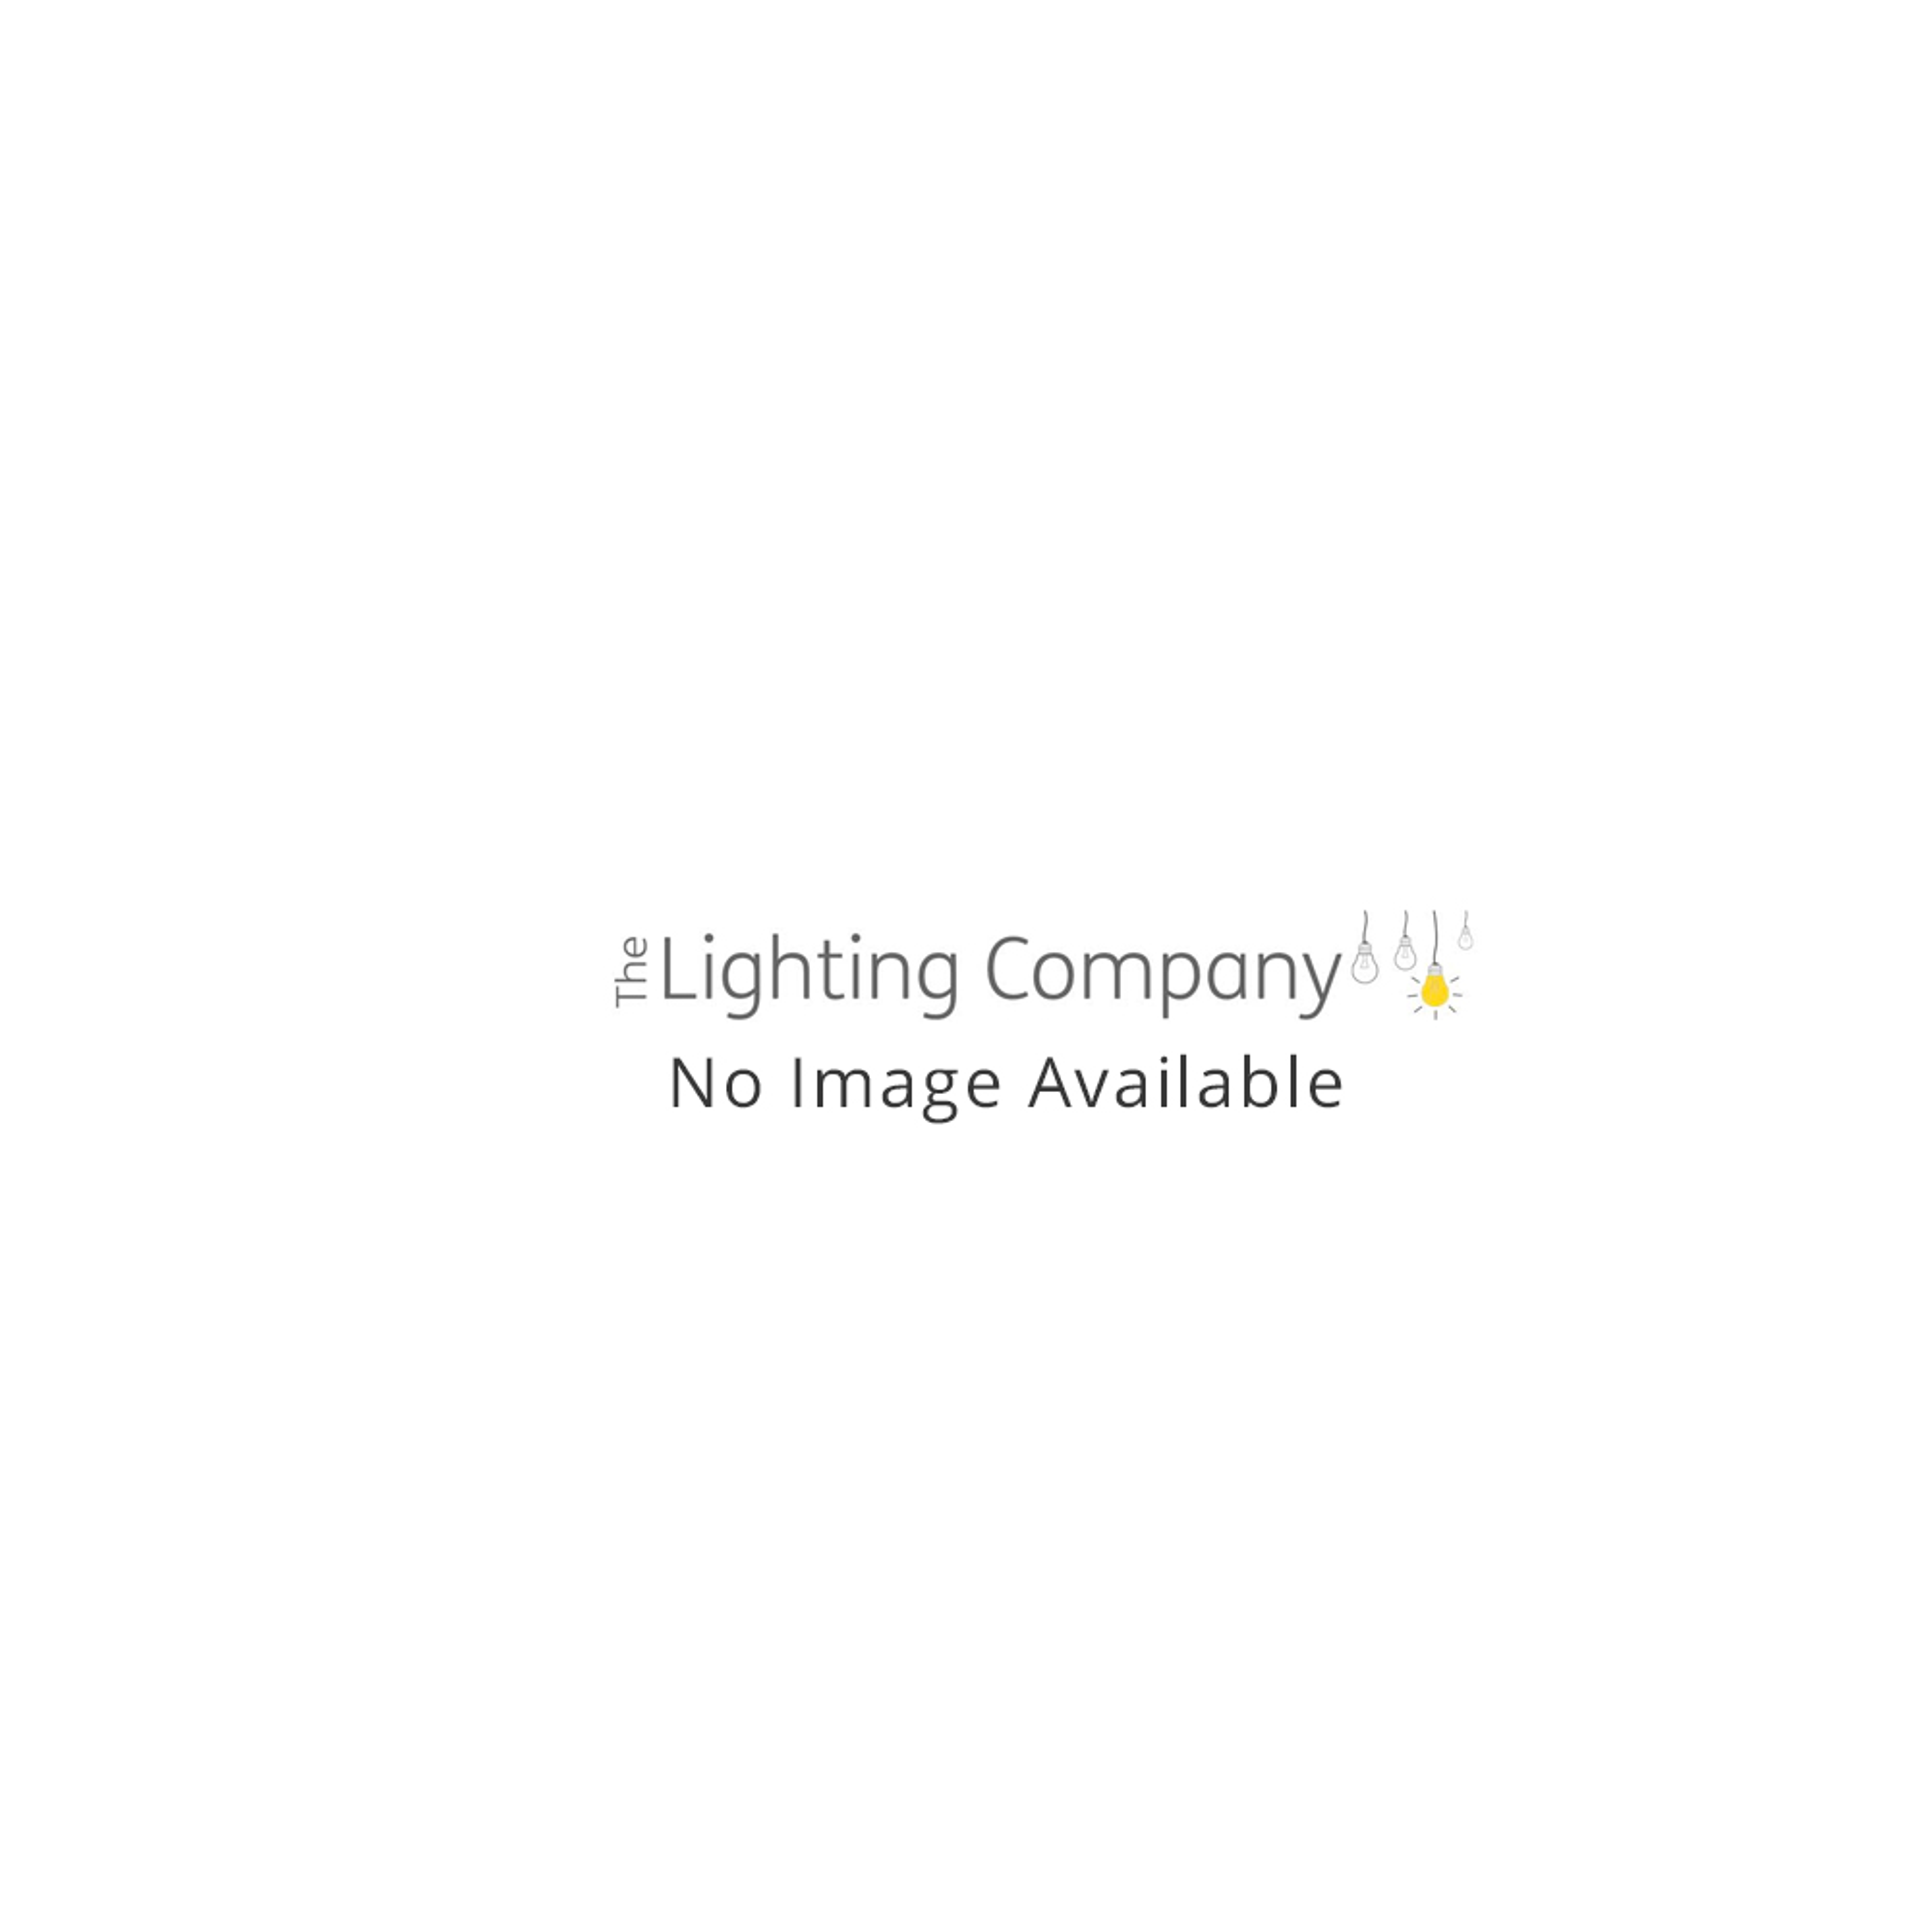 Ceiling Wall Spotlight : Single Wall or Ceiling Spotlight with Adjustable Head